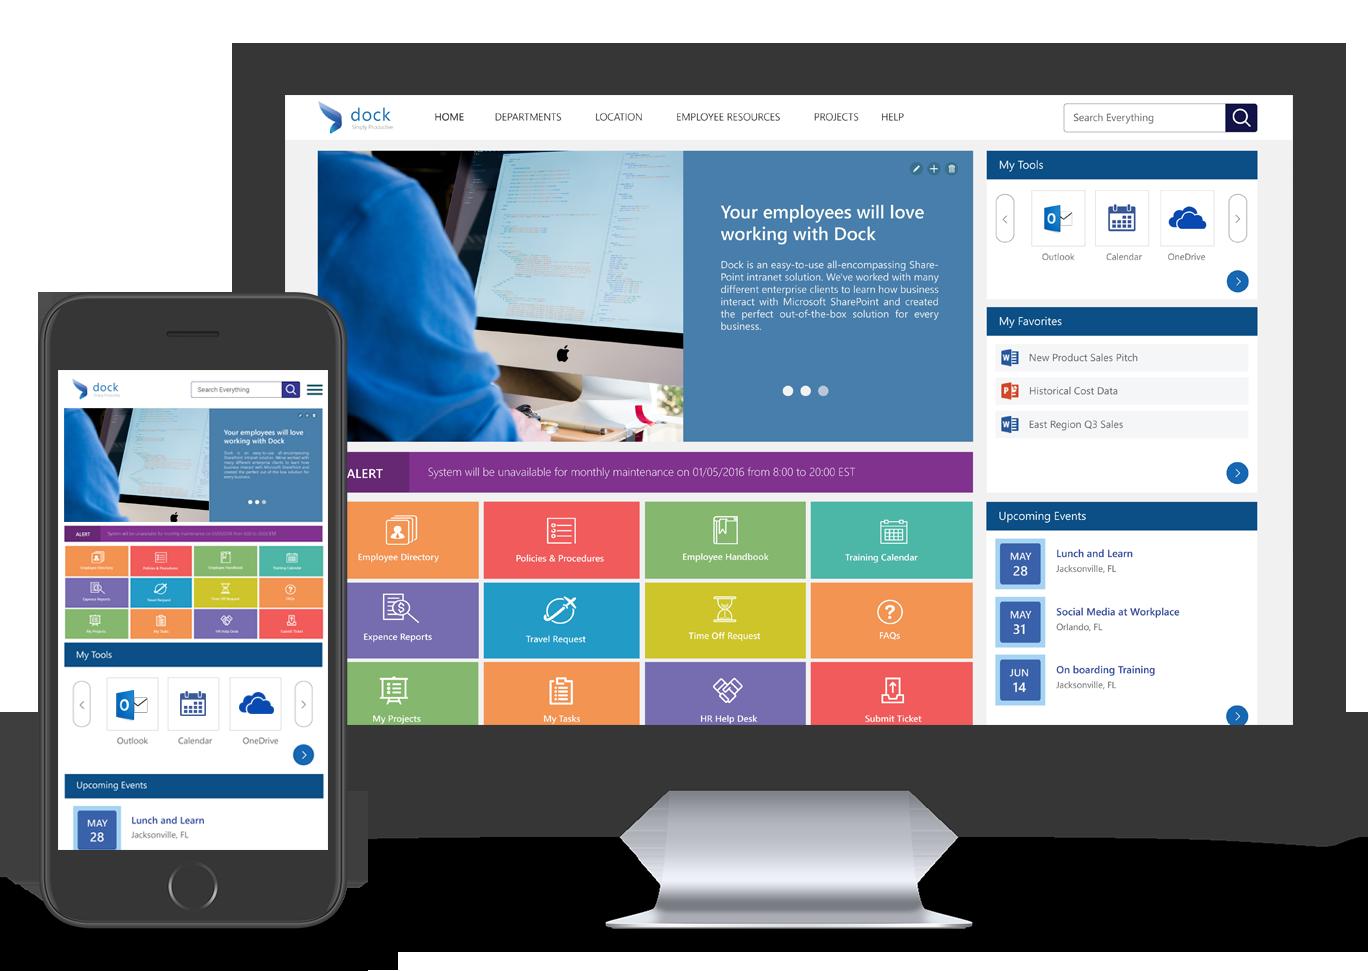 sharepoint team collaboration